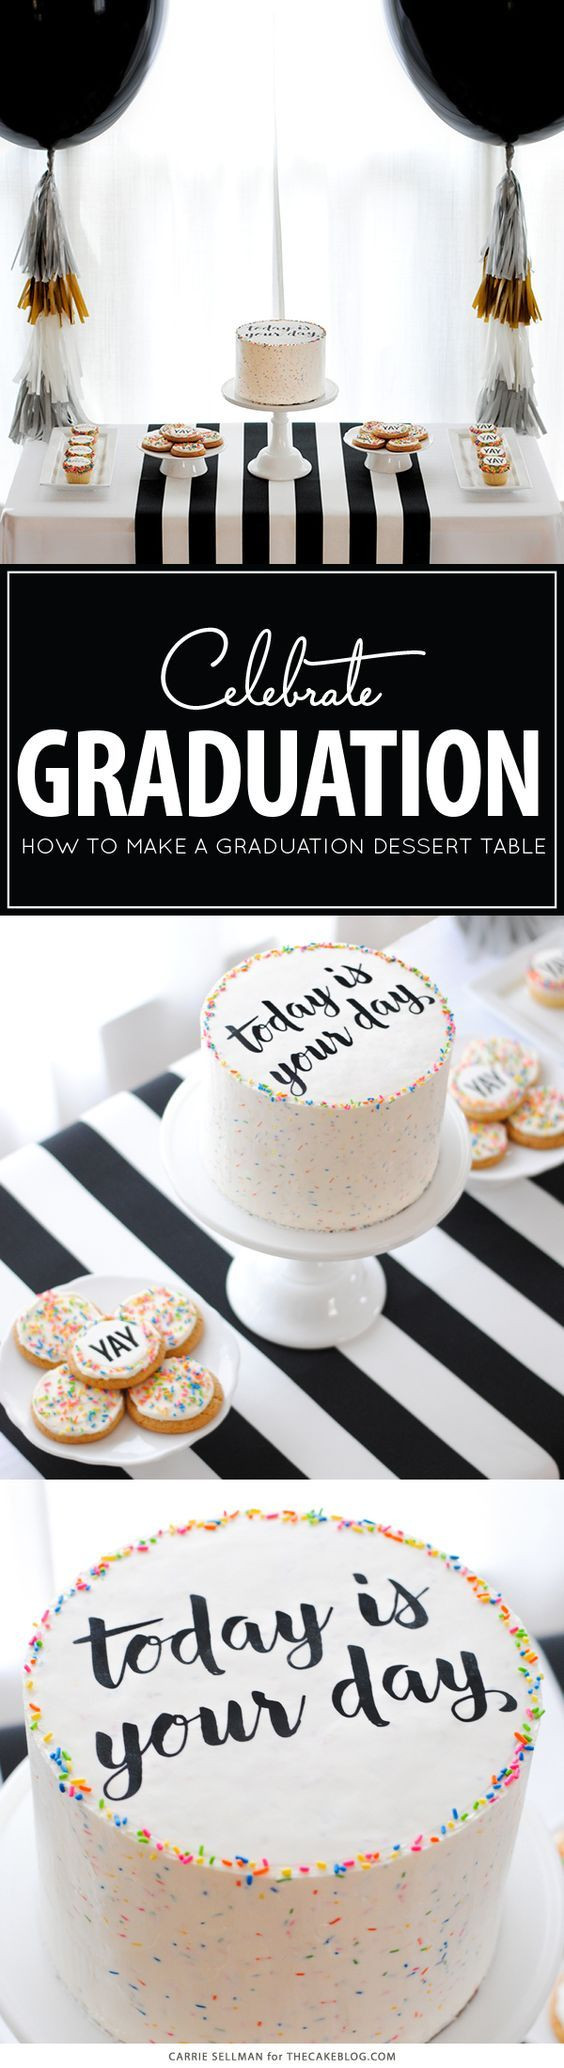 Graduation Party Desserts  Best 25 College graduation cakes ideas on Pinterest